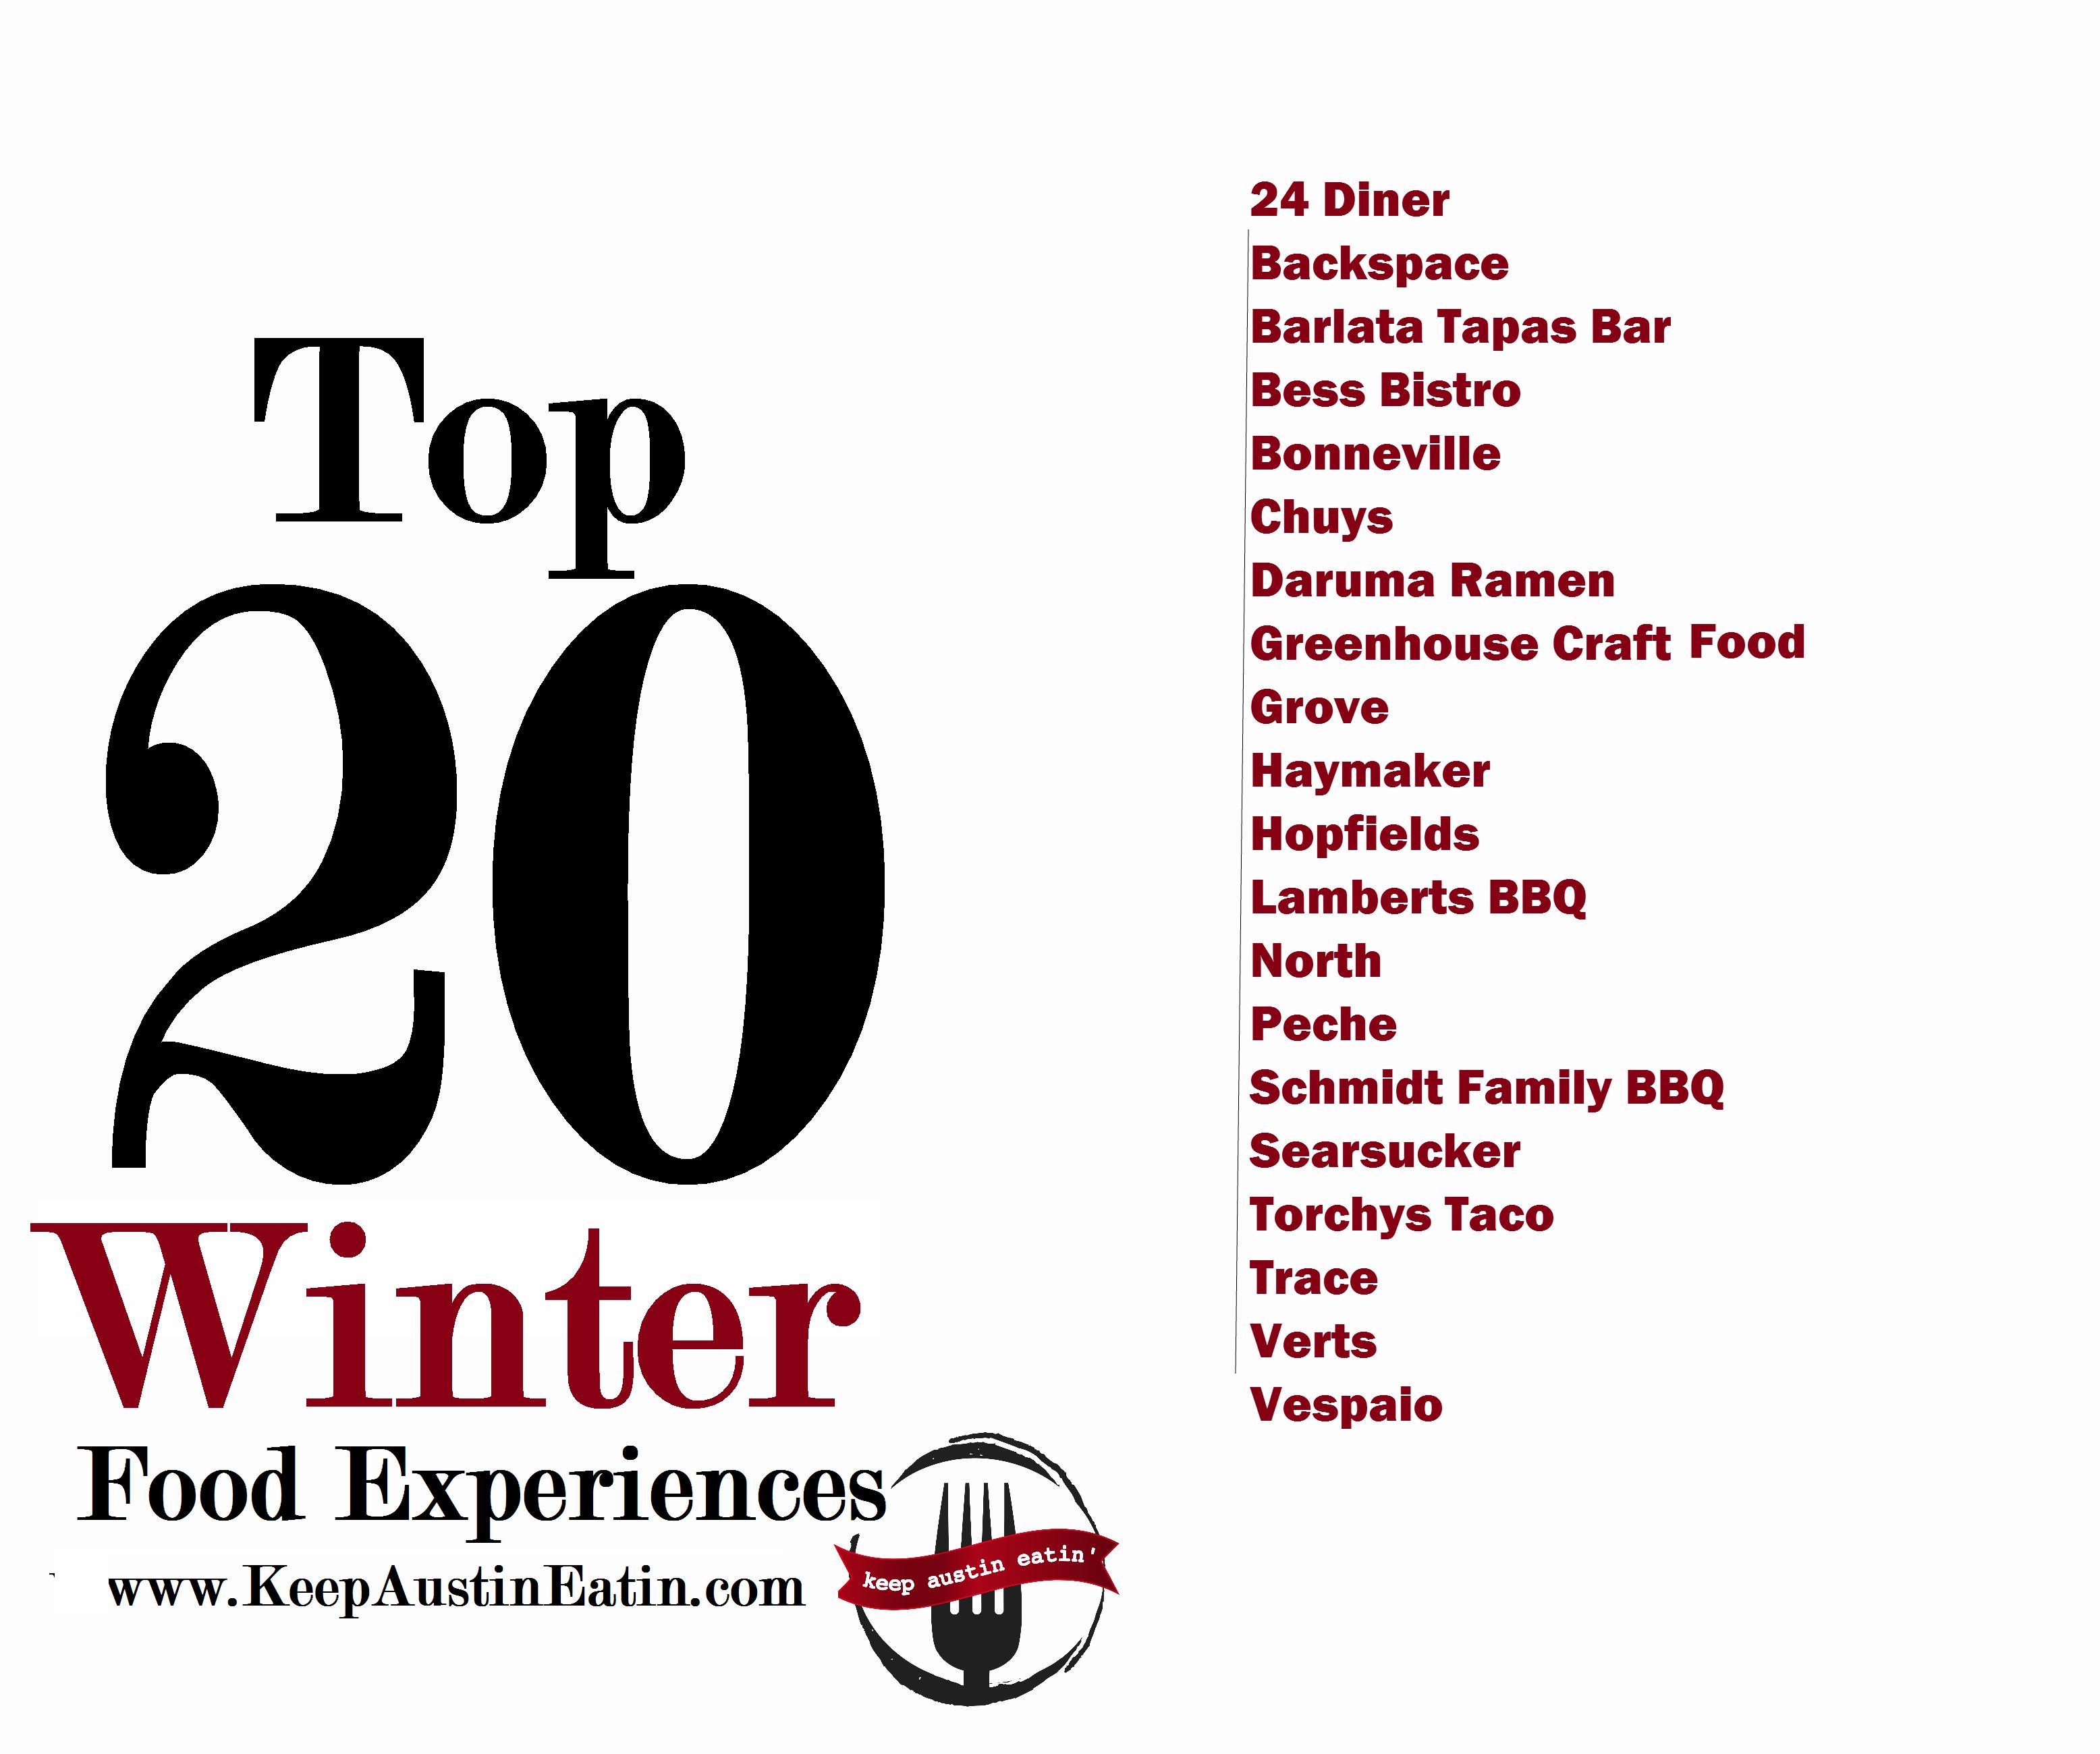 TOP 20 WINTER FOOD EXPERIENCES